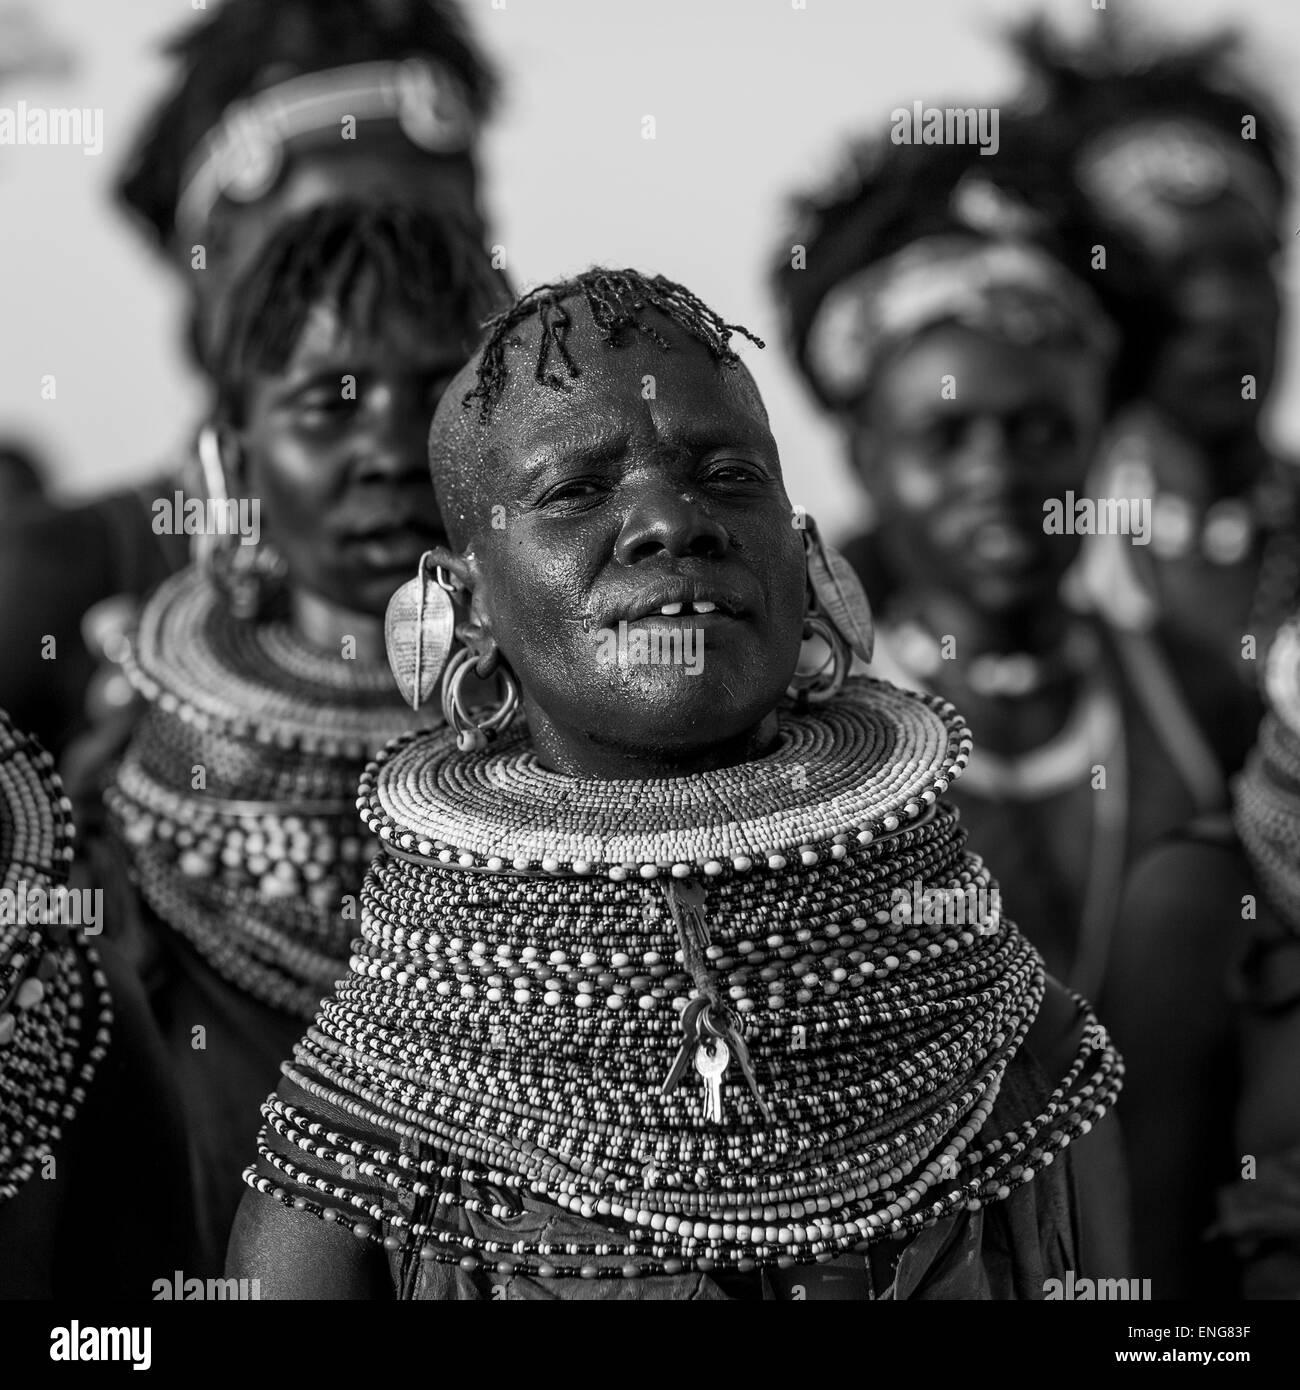 Turkana Tribe Women With Huge Necklaces, Turkana Lake, Loiyangalani, Kenya - Stock Image